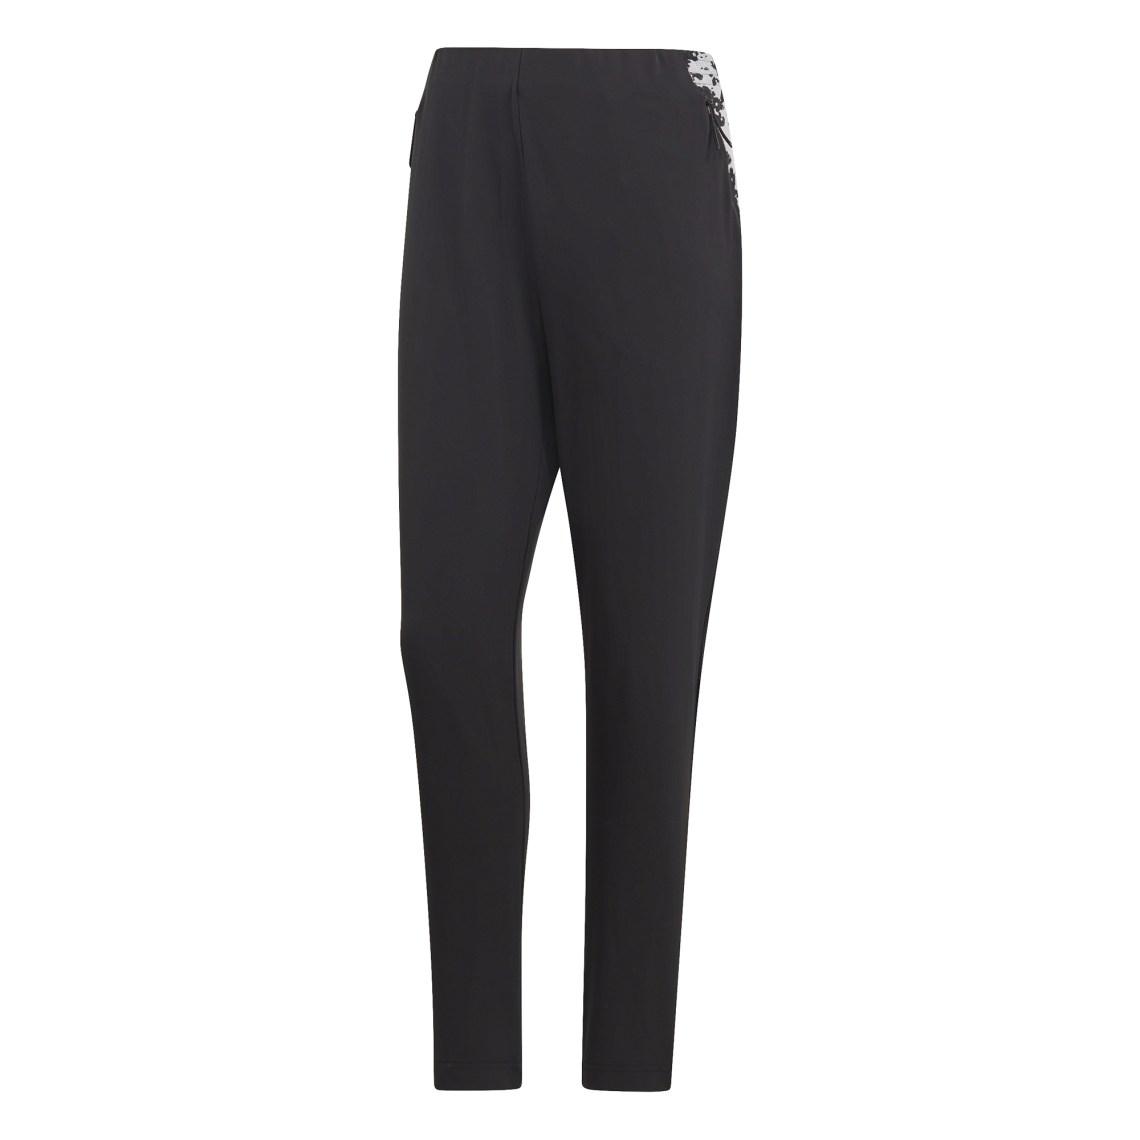 Adidas Pantalon Femme 2